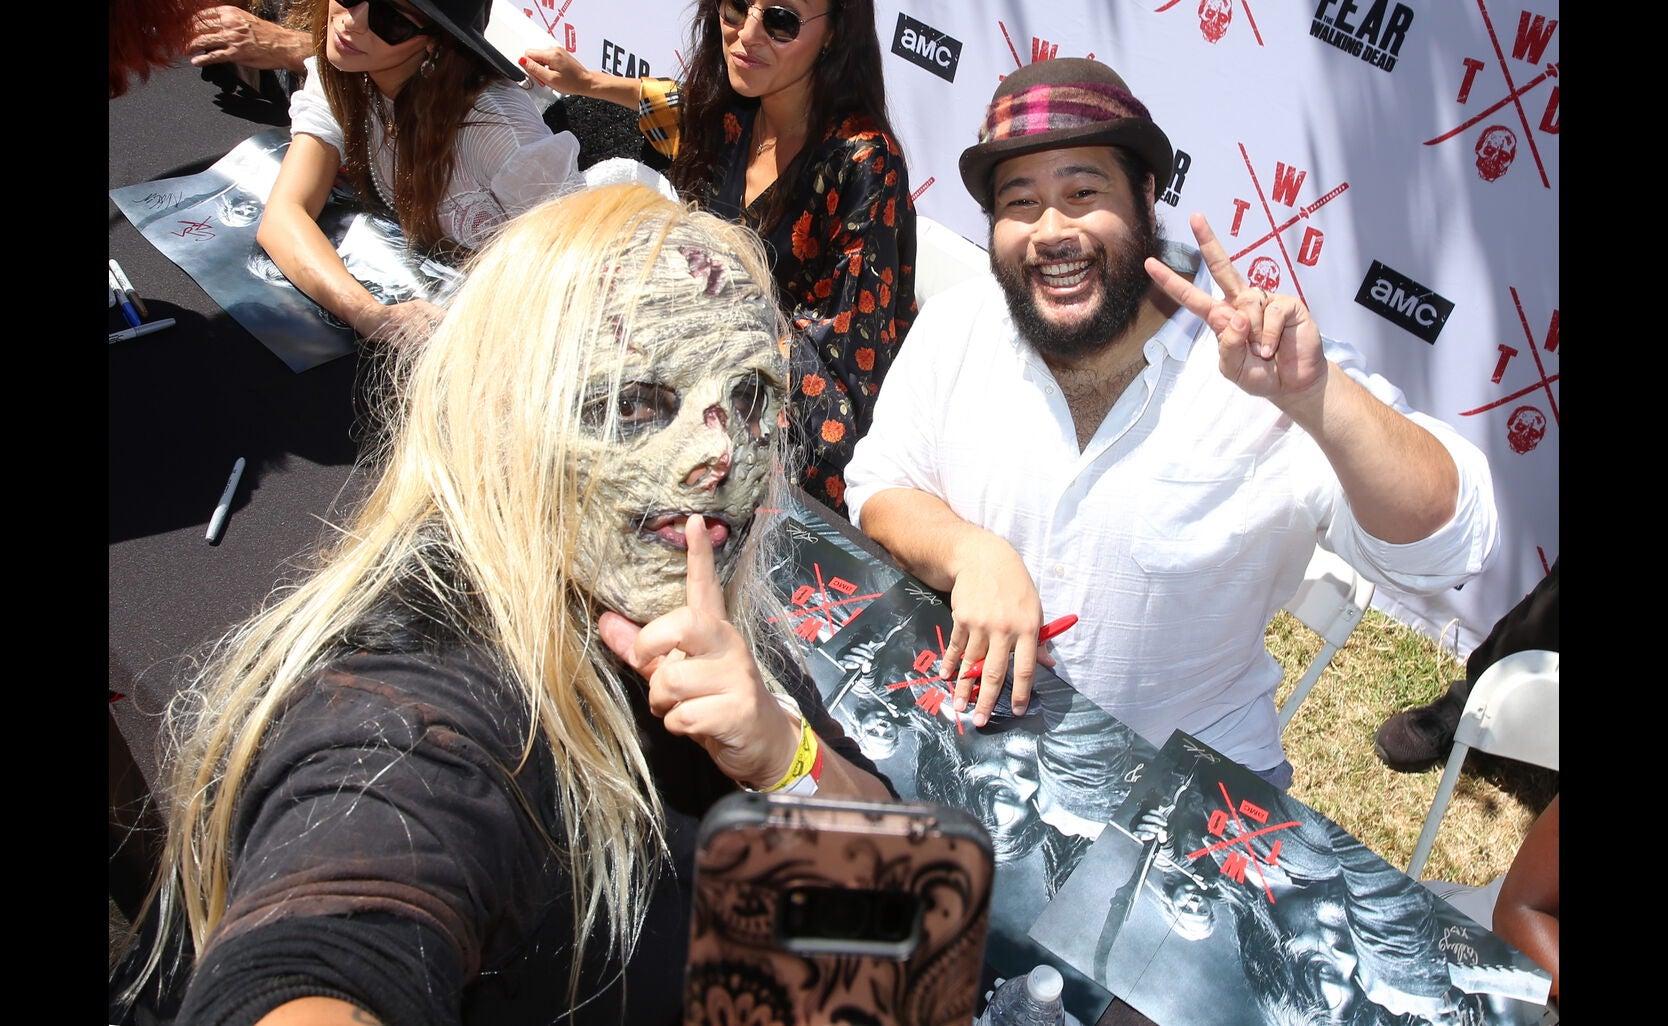 Zombie fan at the 2019 Comic Con